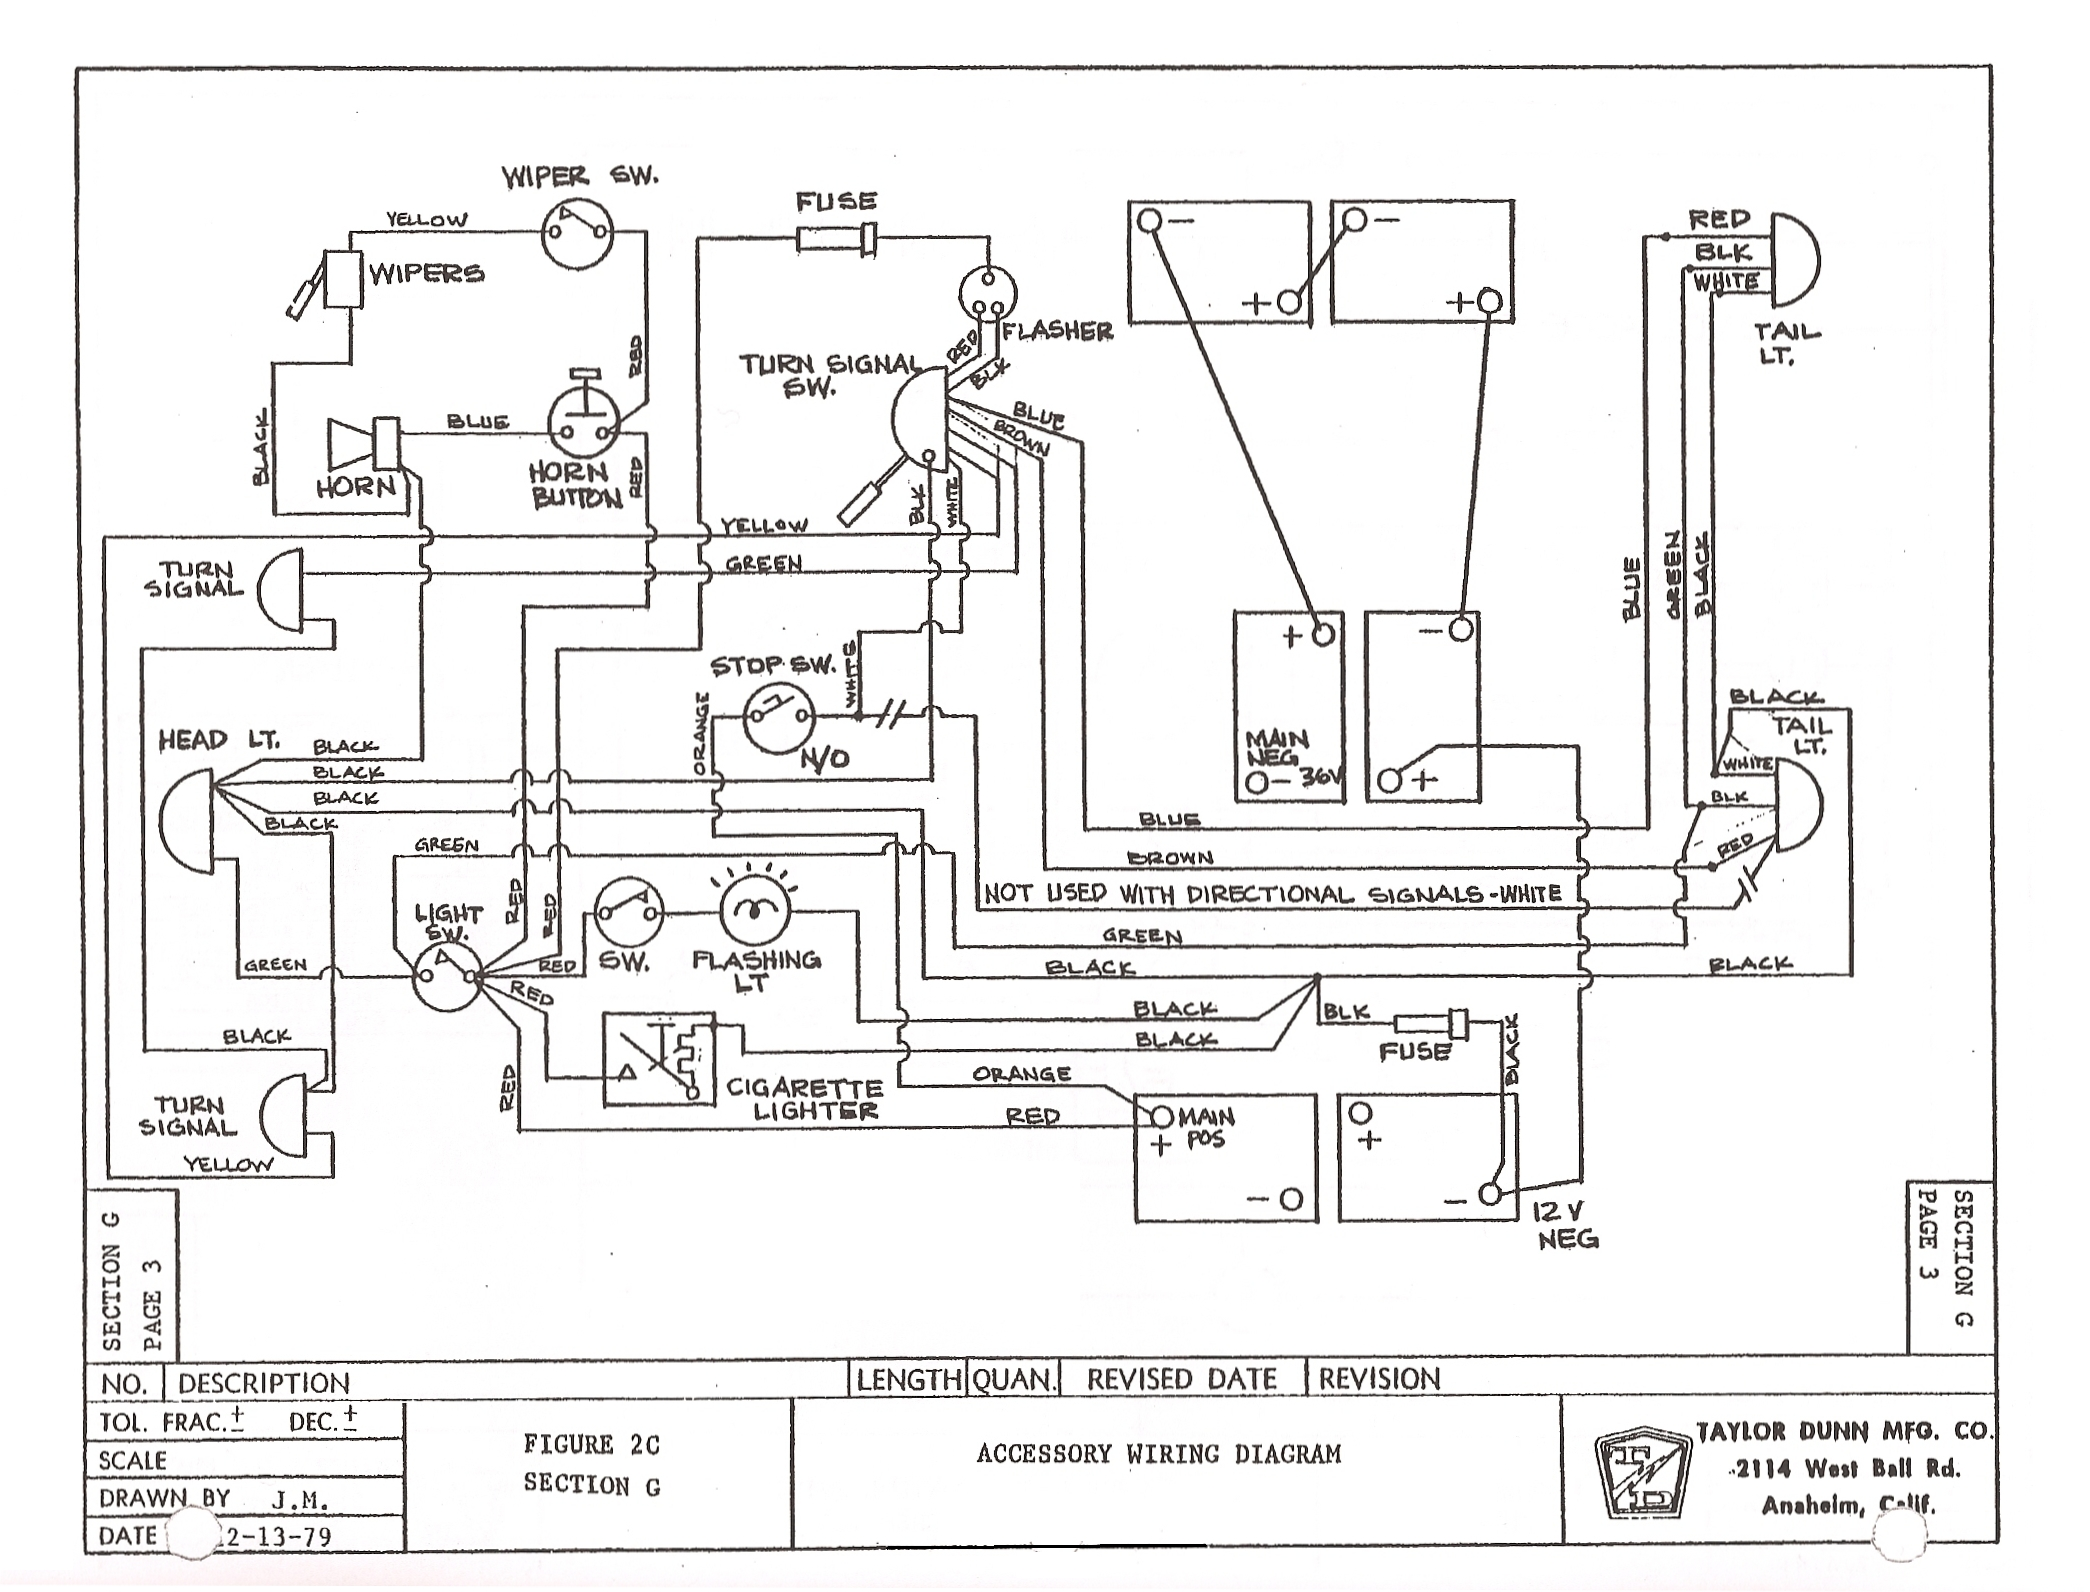 belarus 250as tractor wiring diagram - schema wiring diagrams chase-take -  chase-take.primopianobenefit.it  primopianobenefit.it